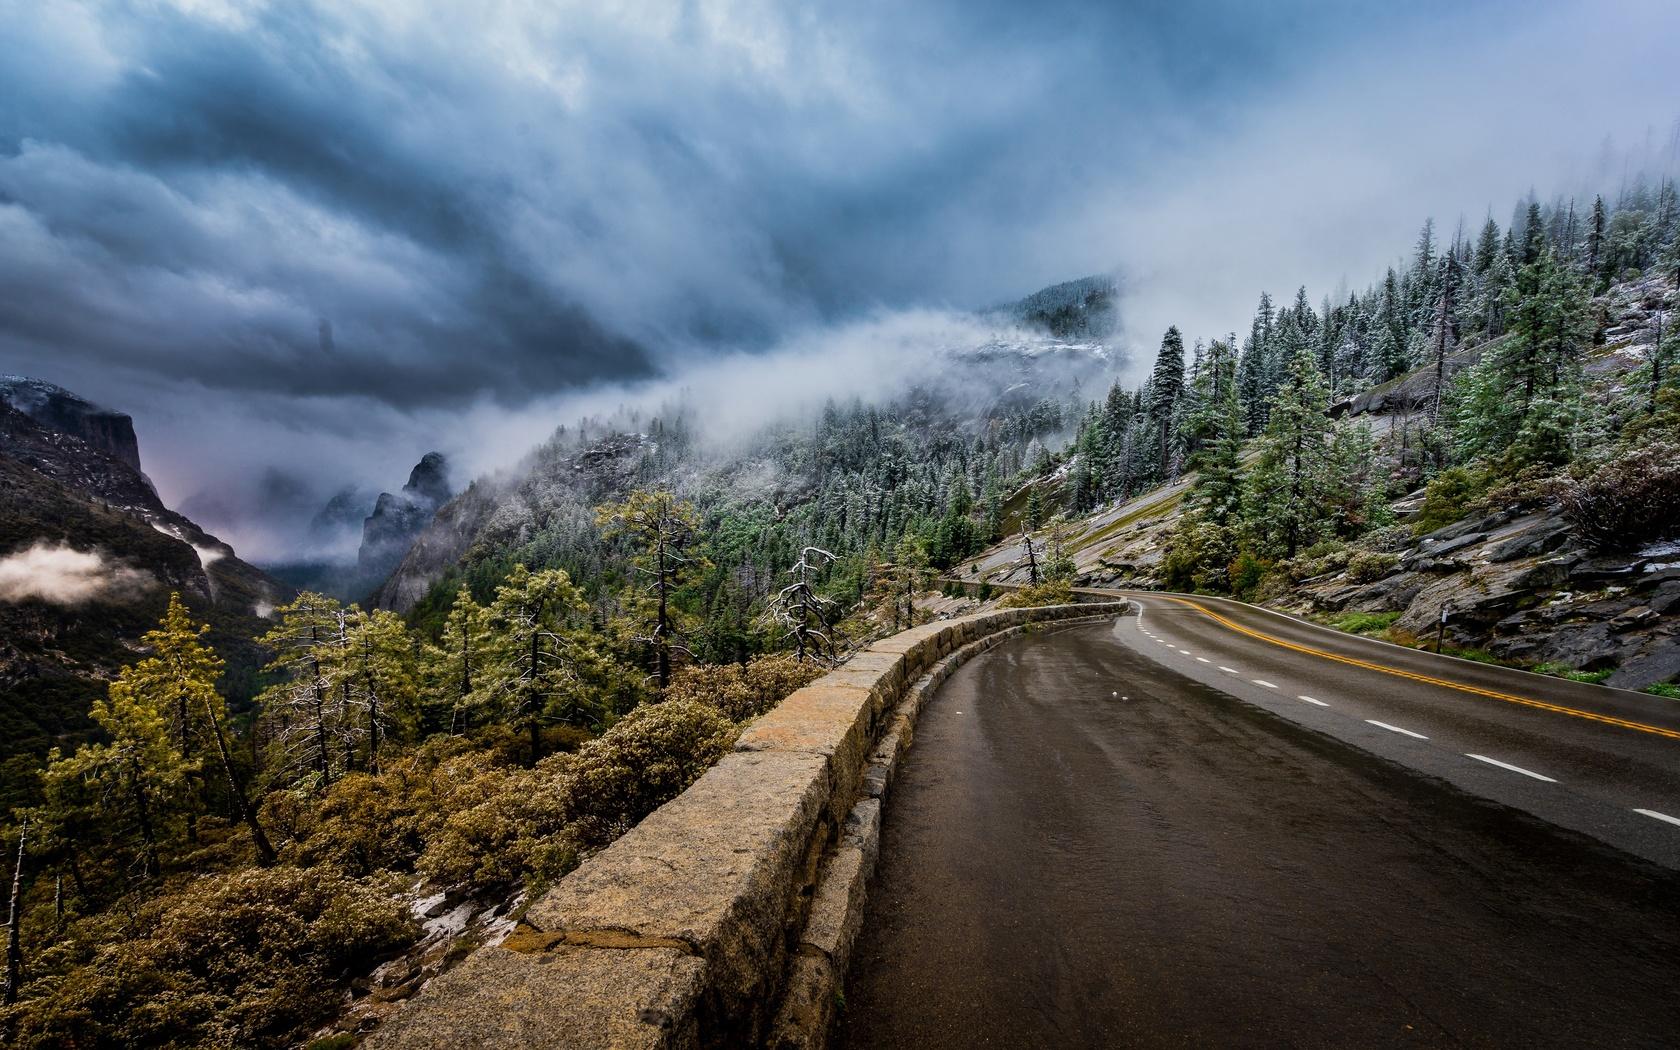 дорога, горы, пейзаж, sierra nevada, облака, деревья, йосемити, туман, калифорния, природа